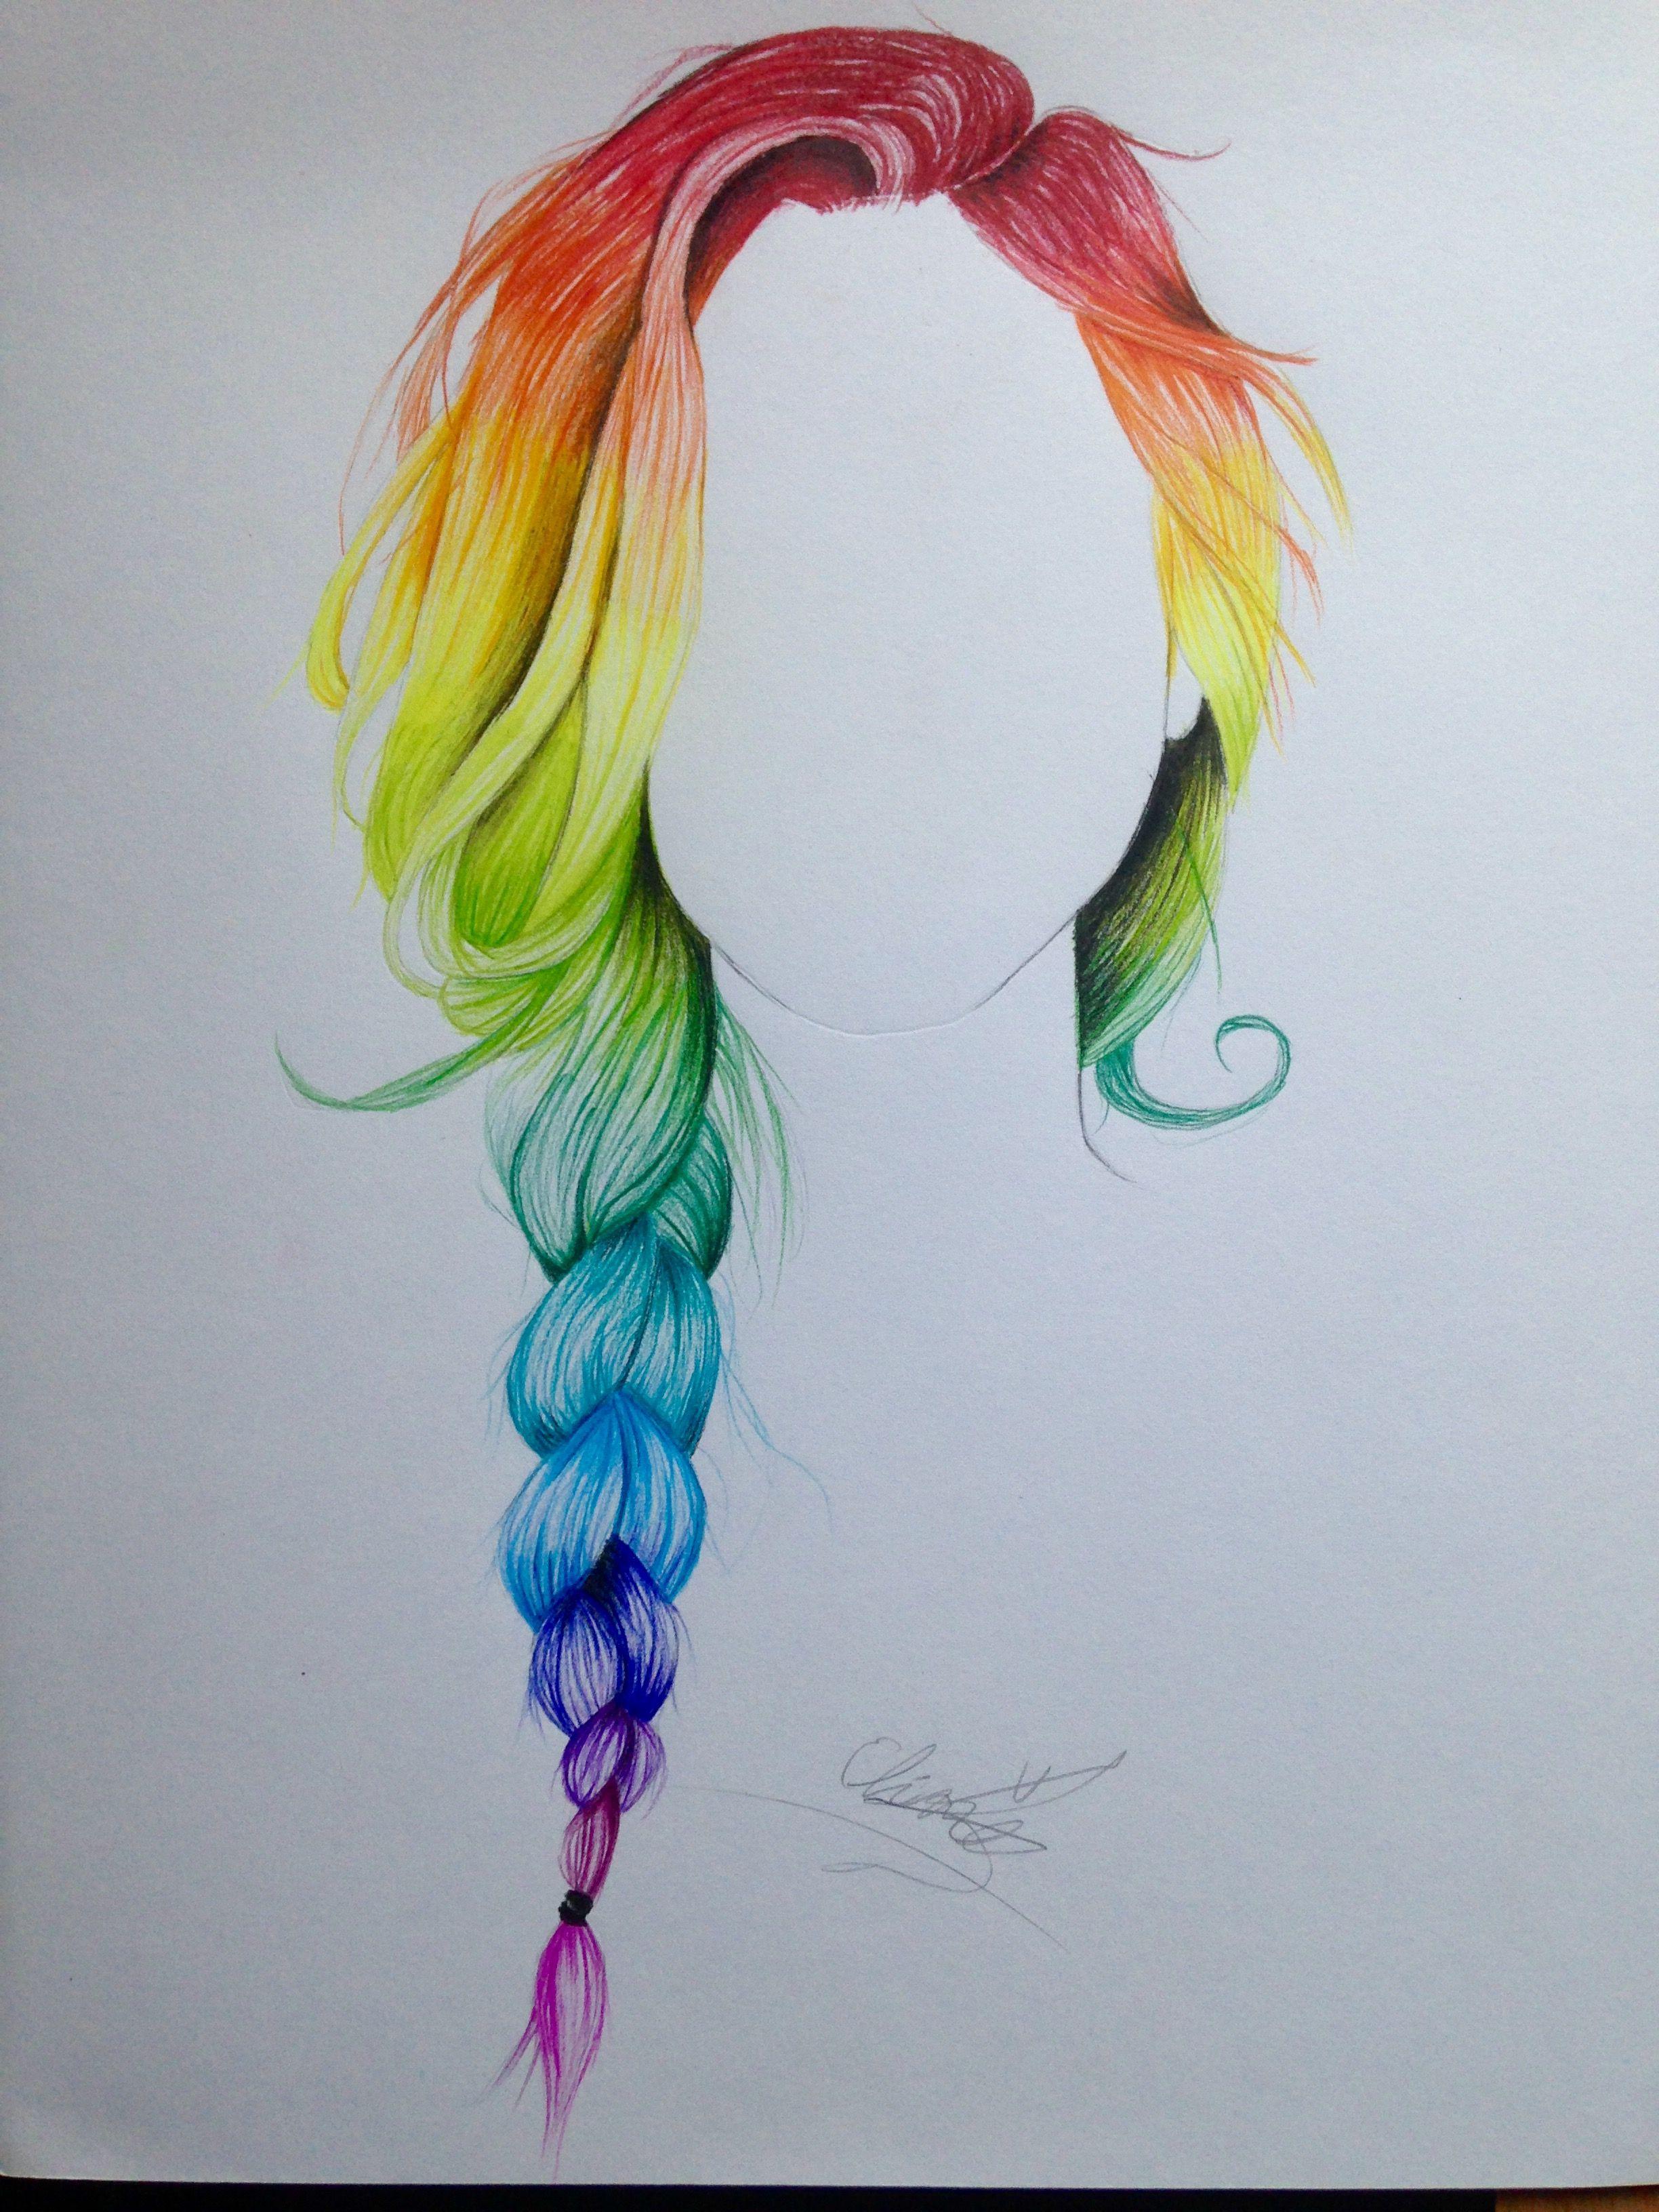 2448x3264 Ashanti New Hairstyle Braid Hair, Rainbows And Drawings